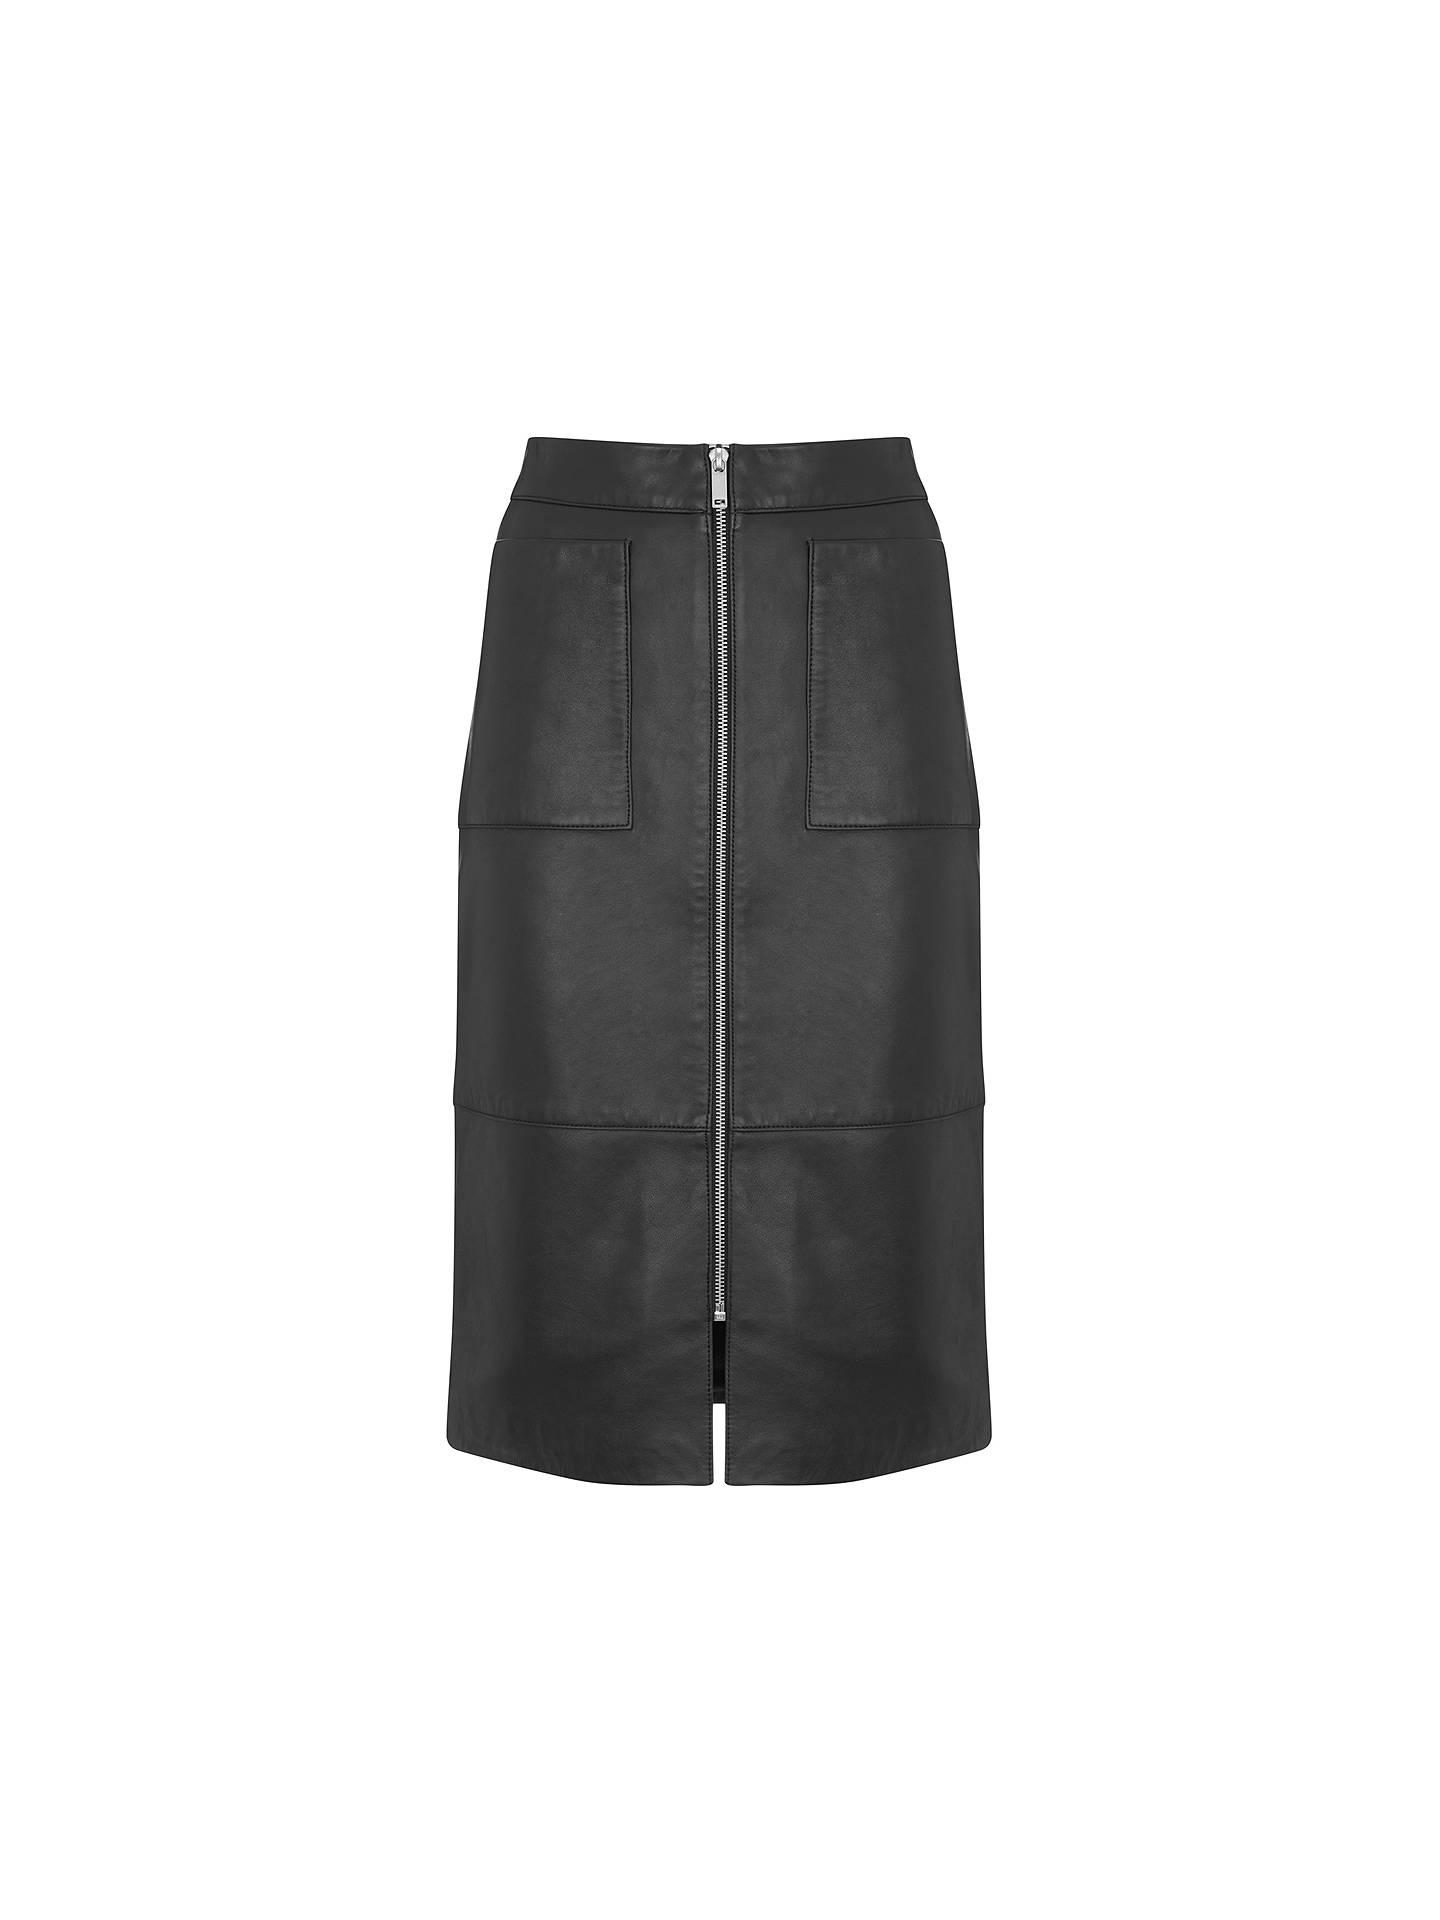 latest fashion new arrival sold worldwide Mint Velvet Leather Pocket Pencil Skirt, Black at John Lewis ...